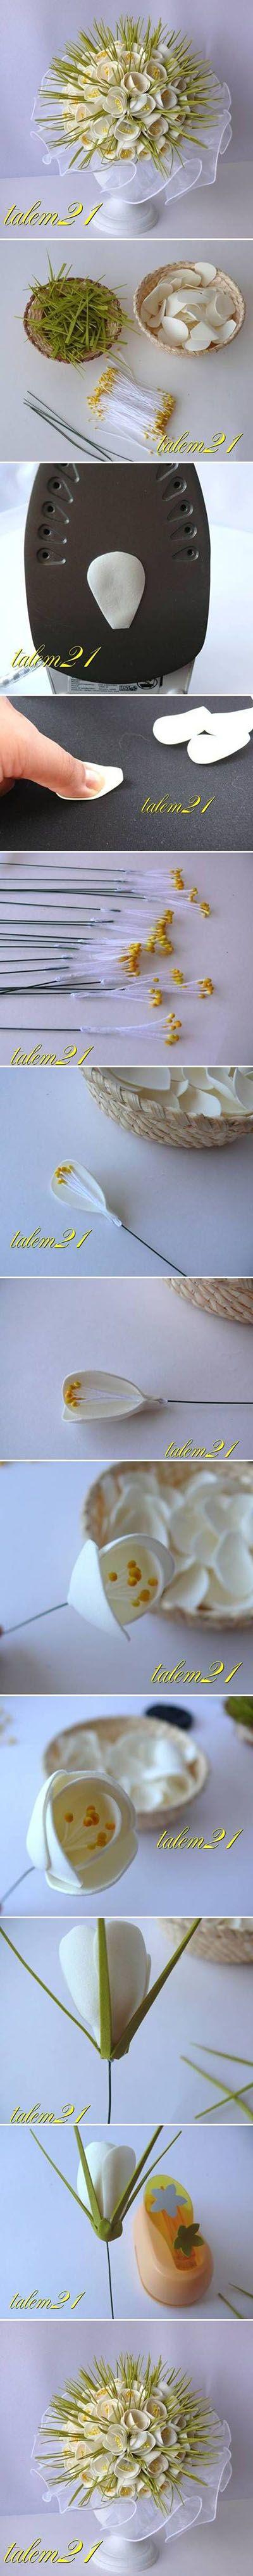 Diy Beautiful Flower | DIY & Crafts Tutorials